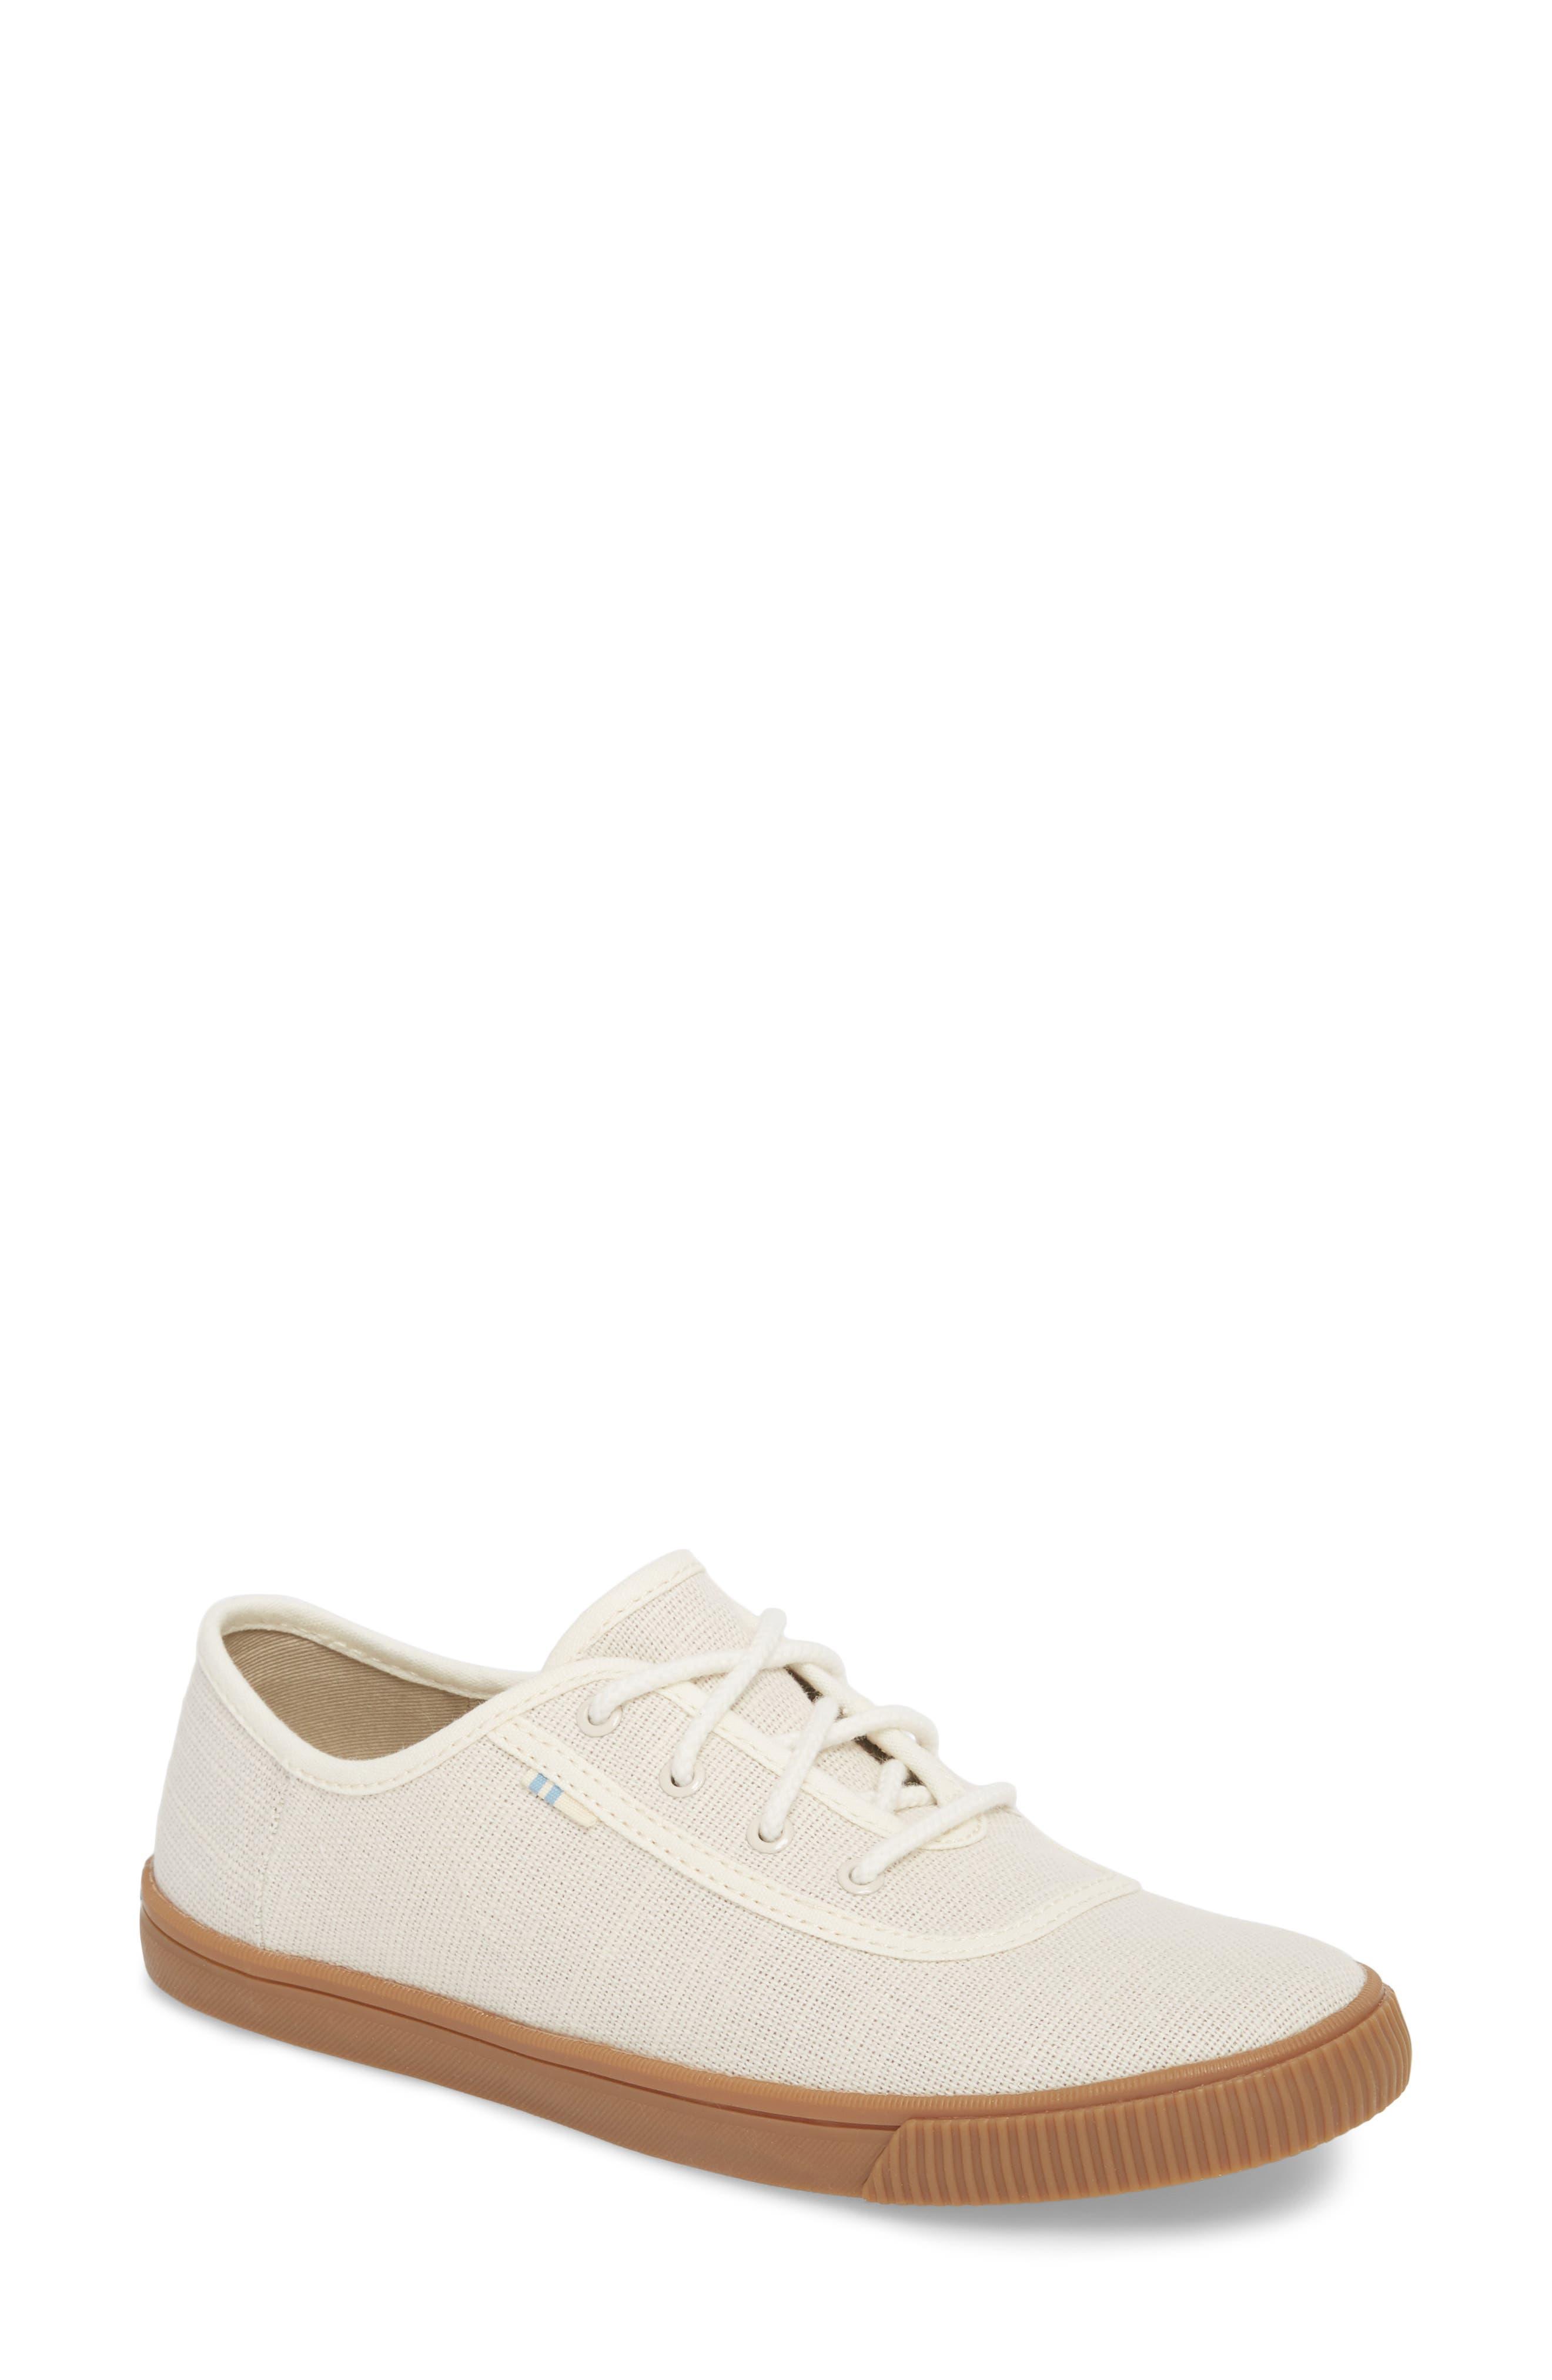 Toms Carmel Sneaker, Ivory